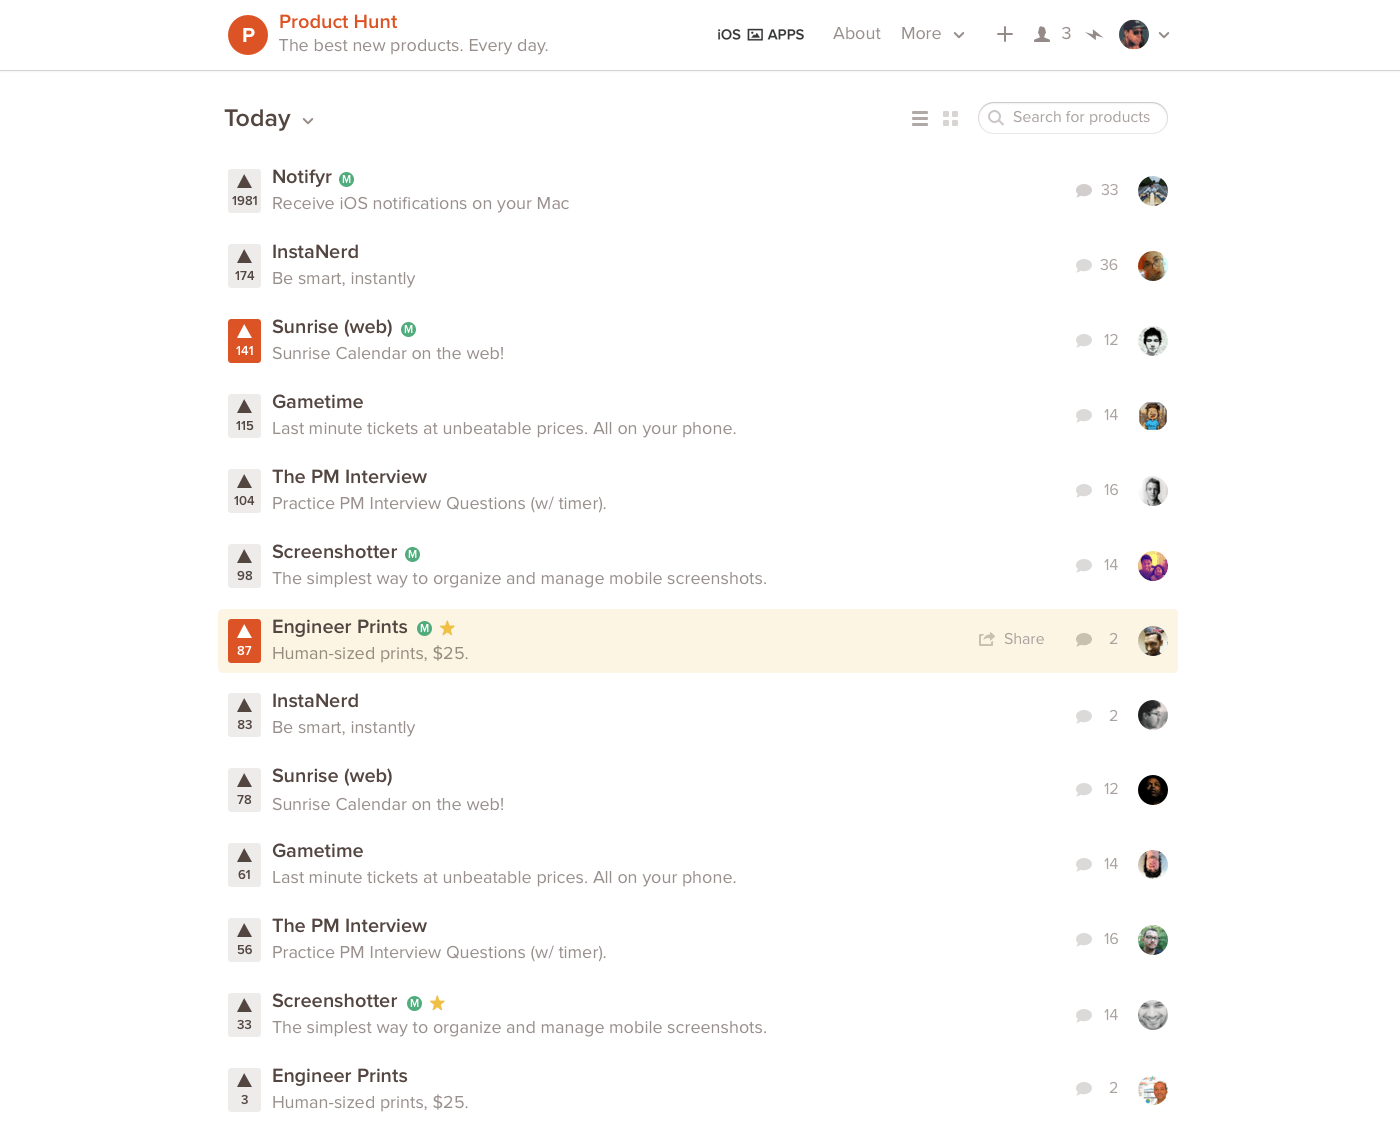 ProductHunt interface design